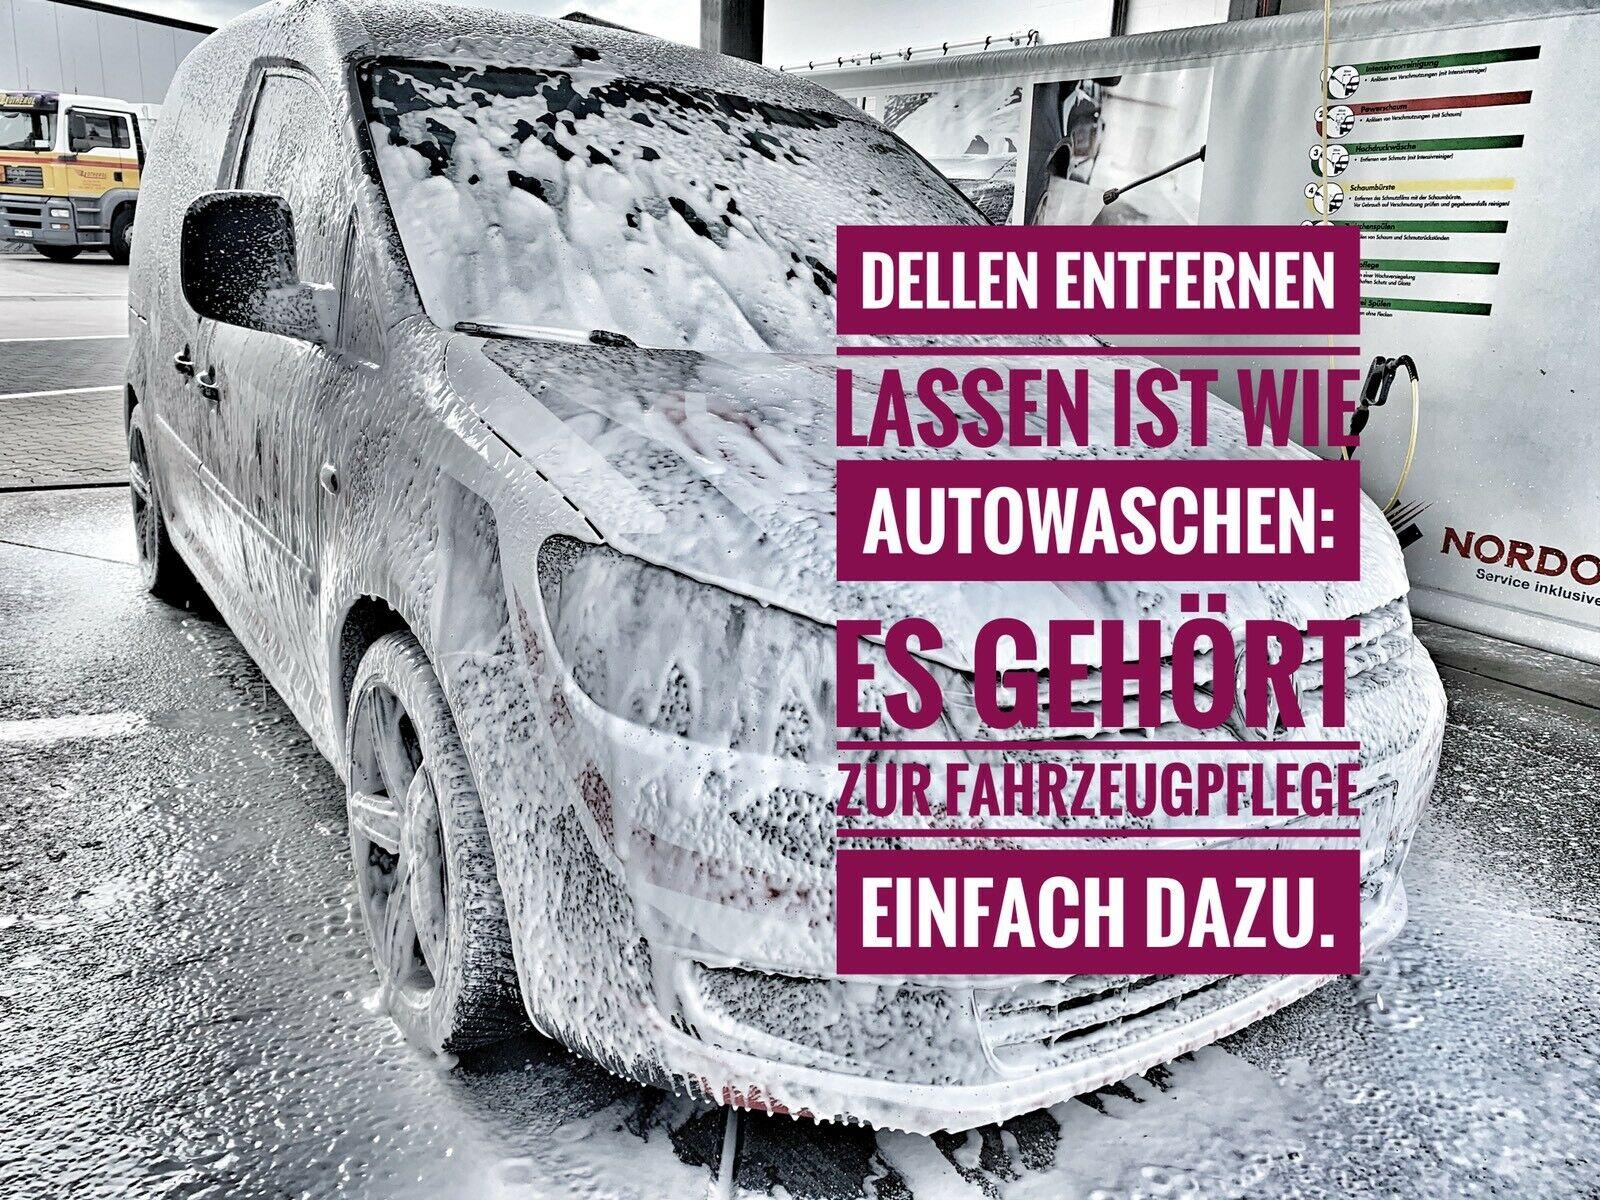 Dellen entfernen lassen ist Fahrzeugpflege